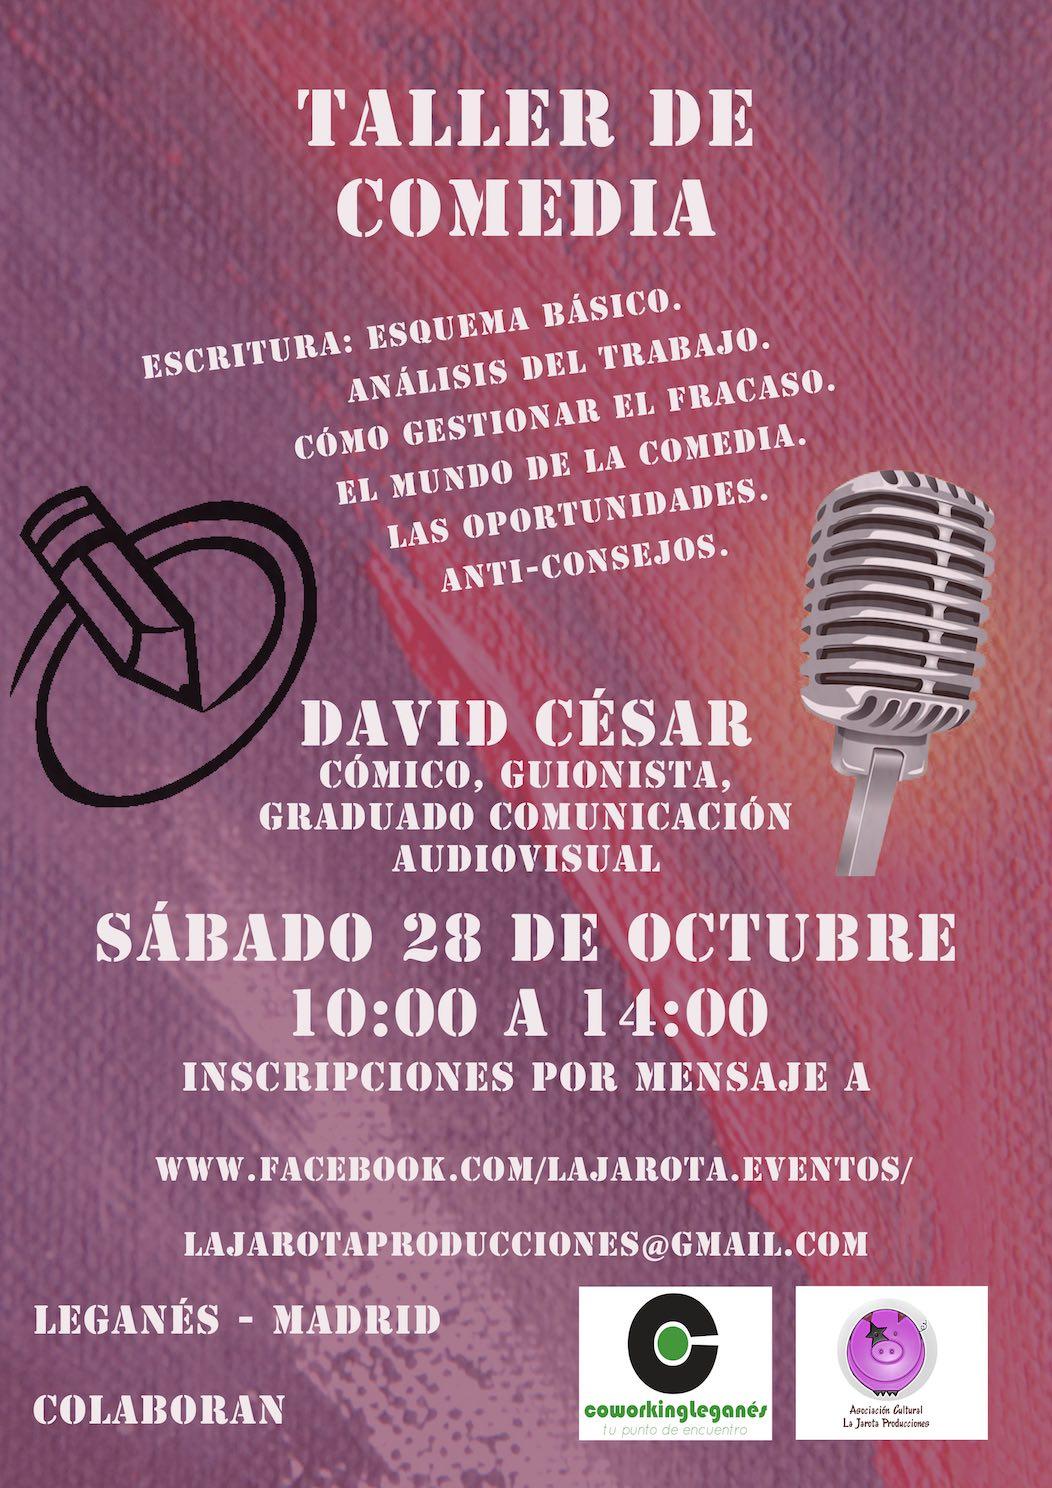 Taller de Comedia by David César